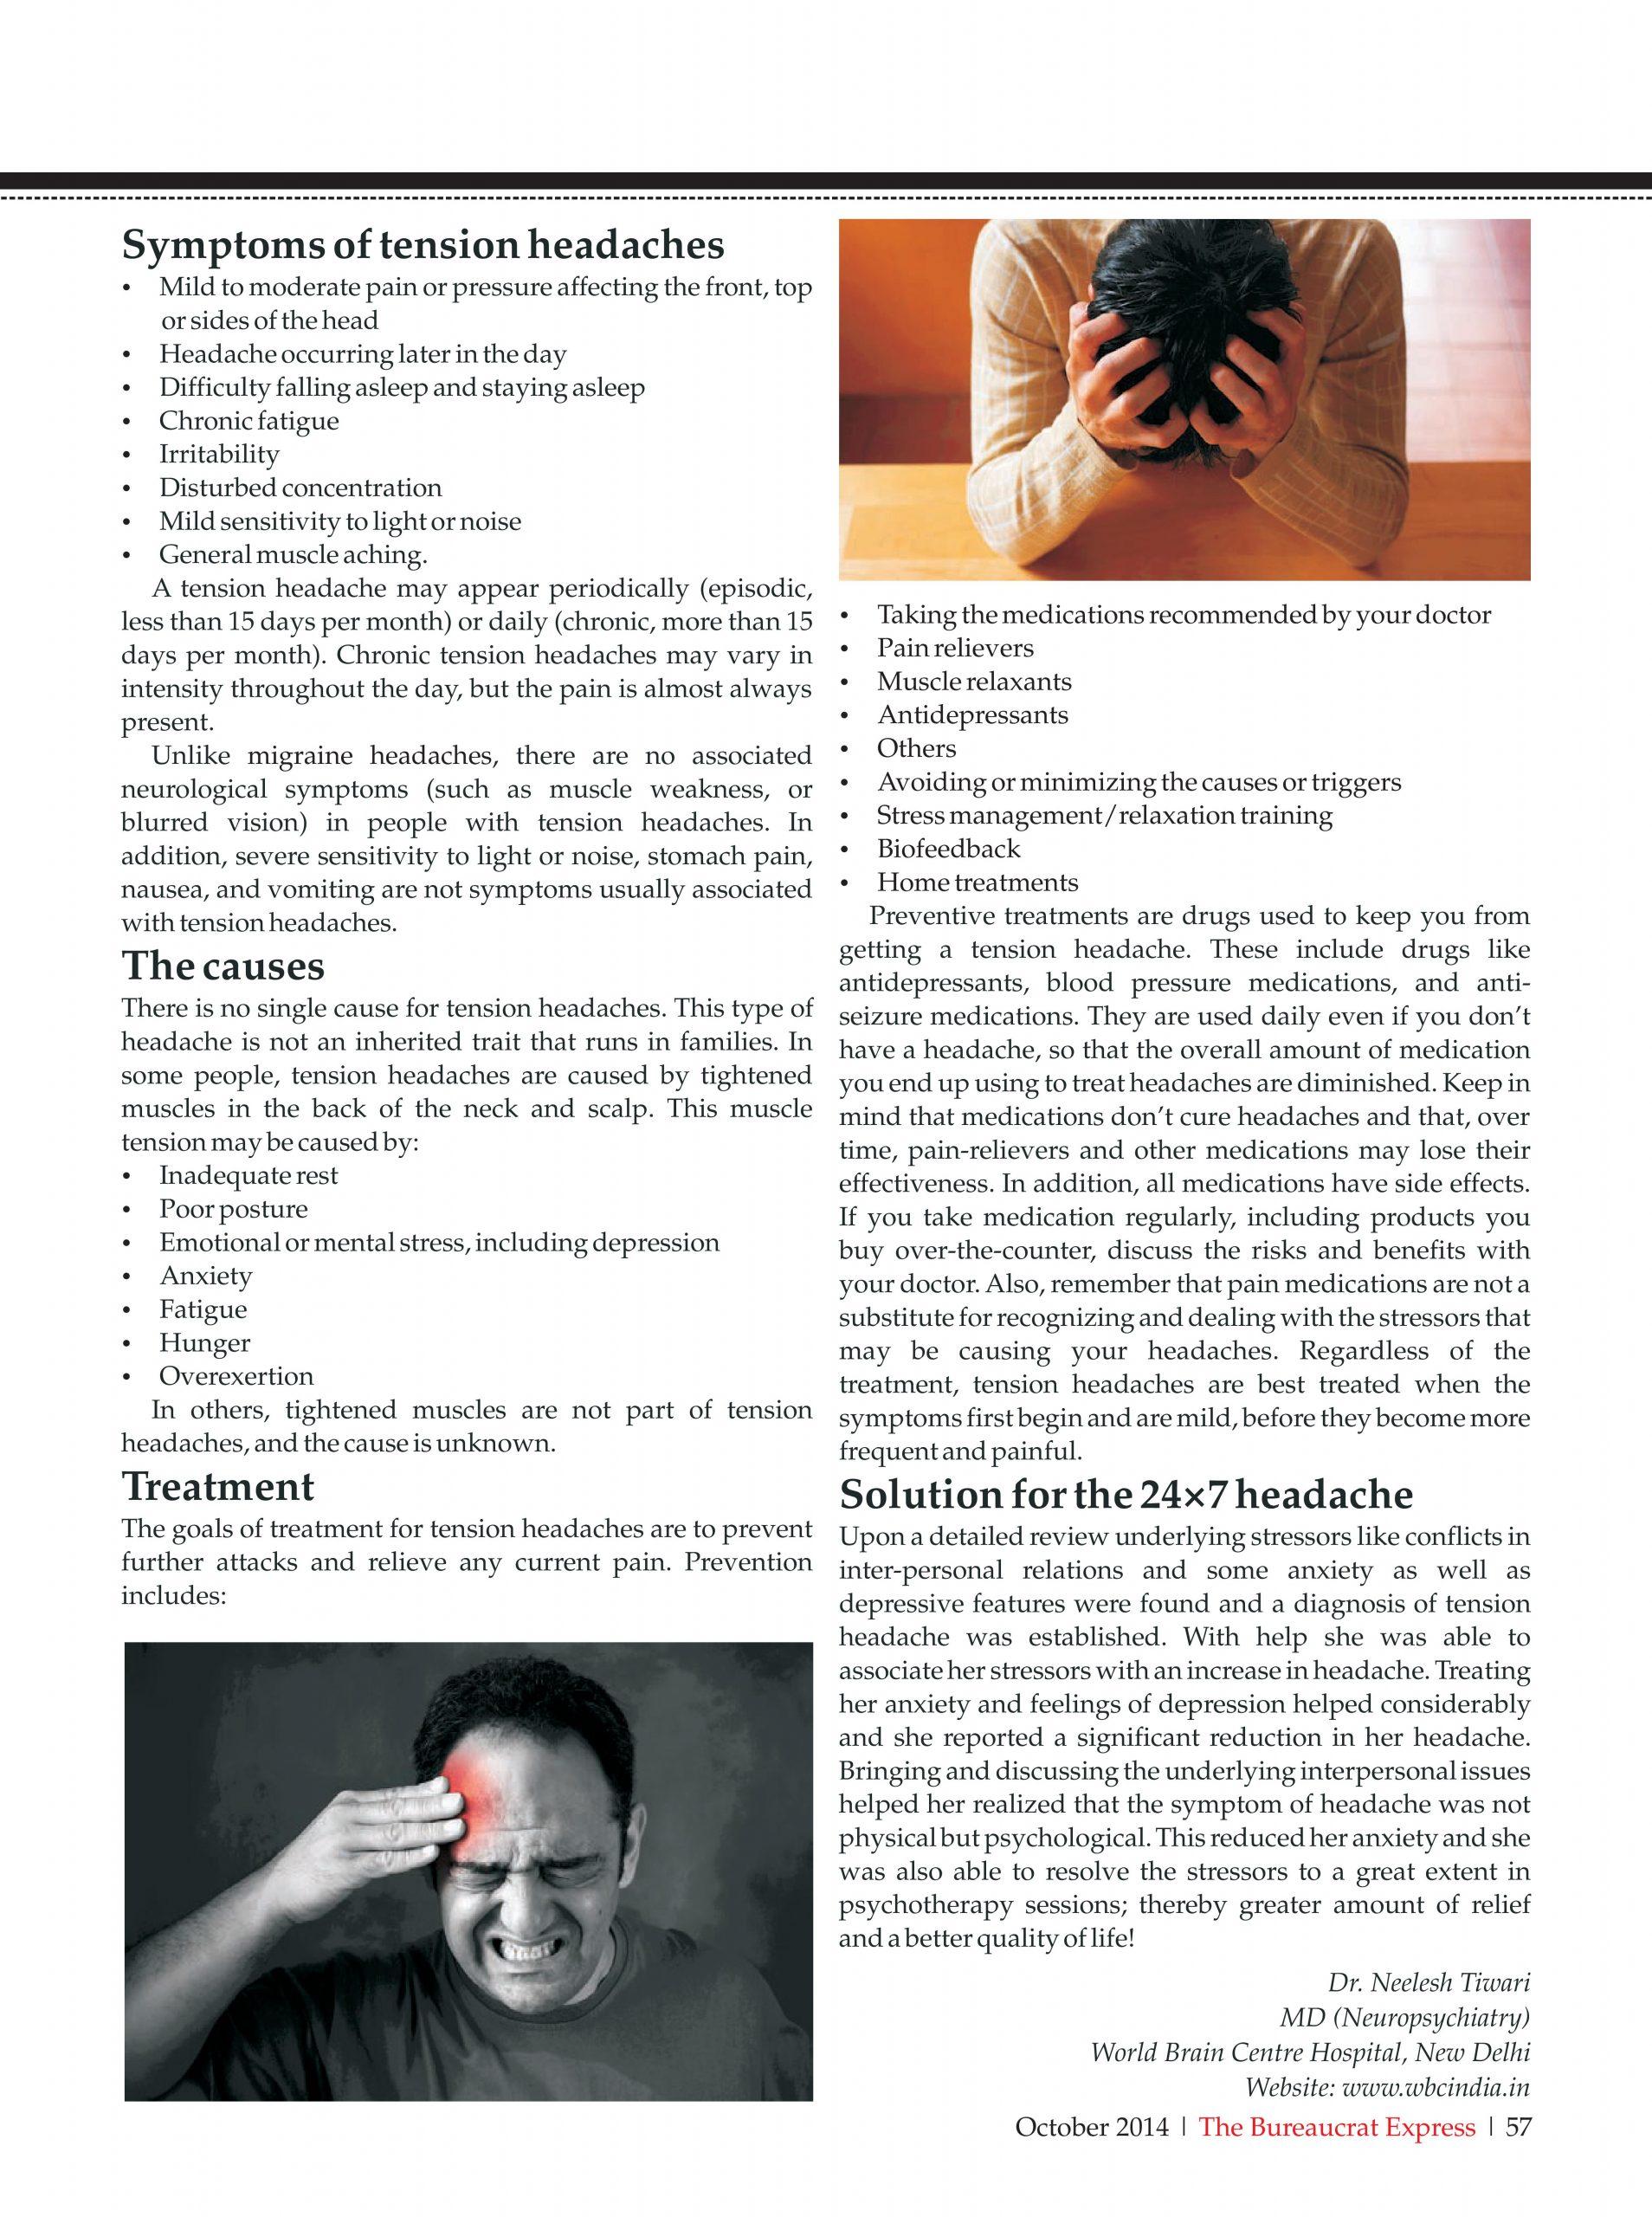 World Brain Center Dr Neelesh Tiwari.JPG466686World Brain Center Dr Neelesh Tiwari.JPG24_OCT, World Brain Center Dr Neelesh Tiwari.JPG4 2